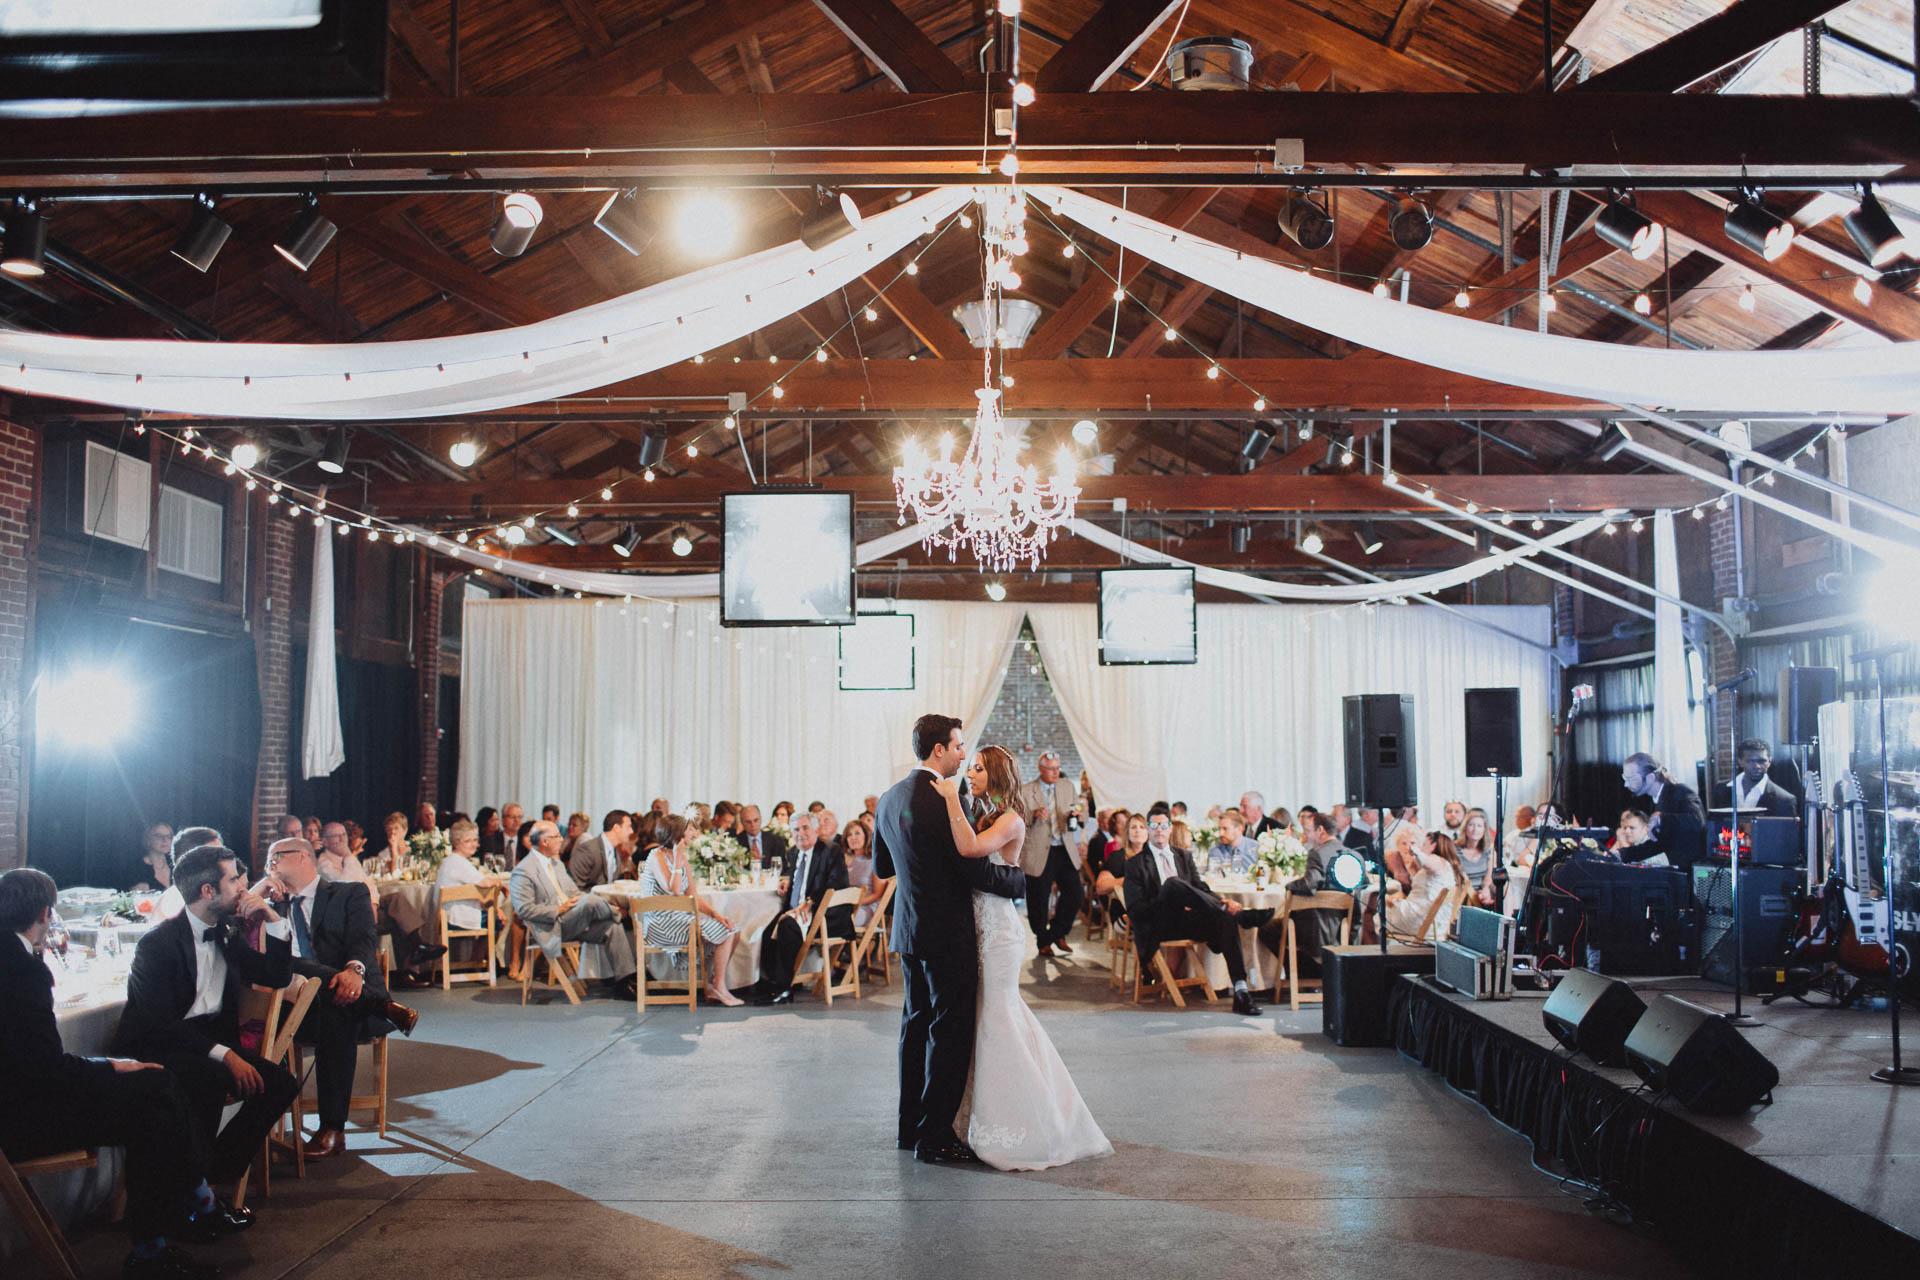 Keri-Joseph-Top-of-the-Market-Wedding-168@2x.jpg